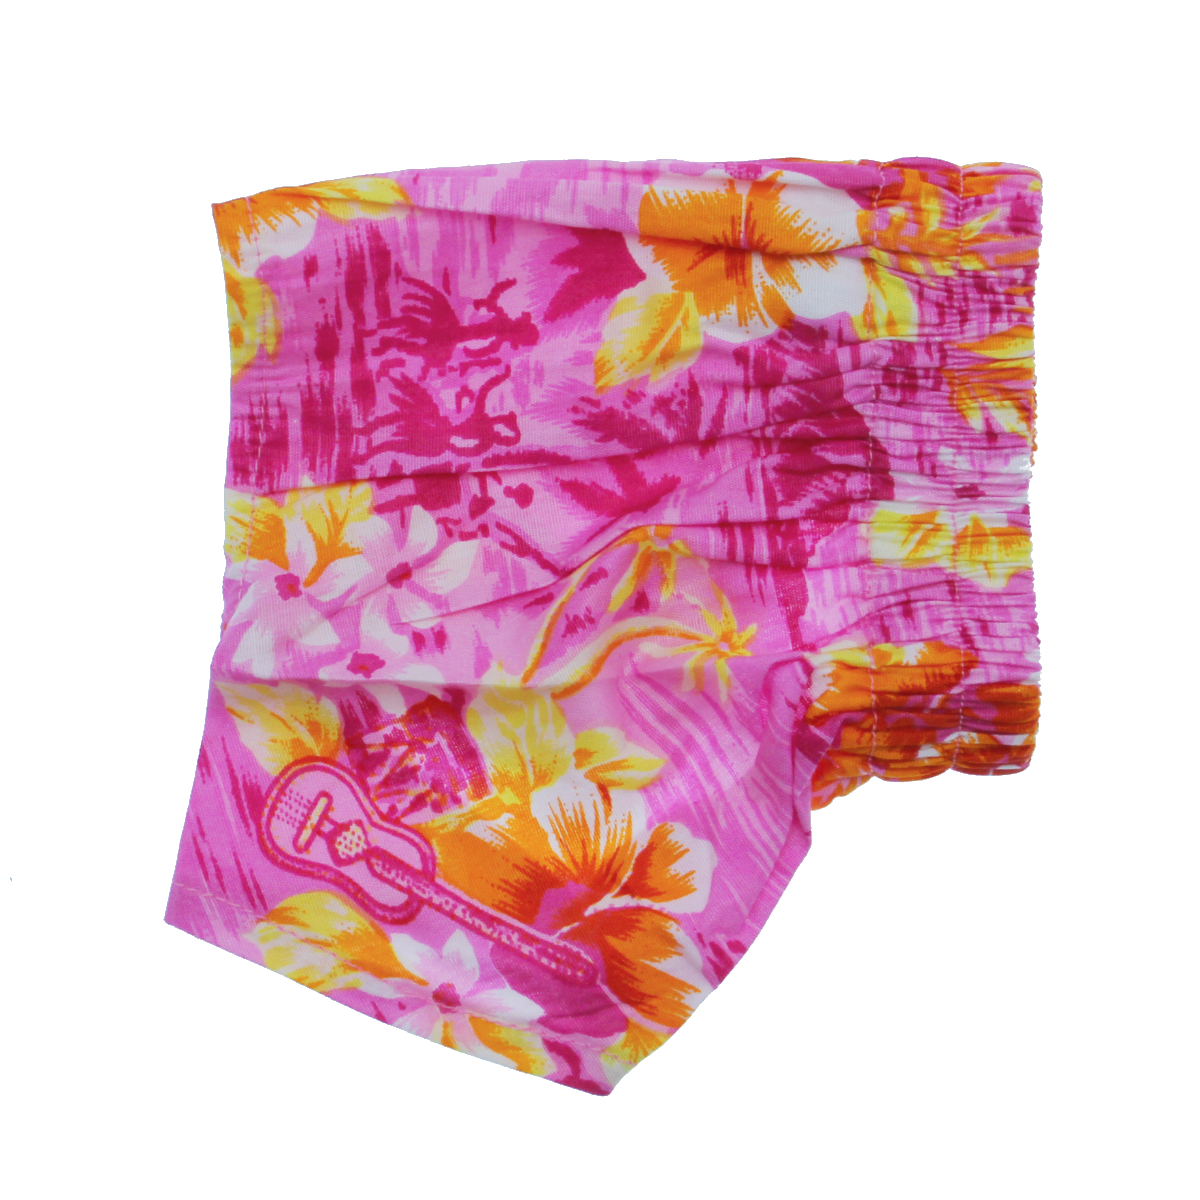 Hawaiian Swim and Board Dog Trunks - Pink